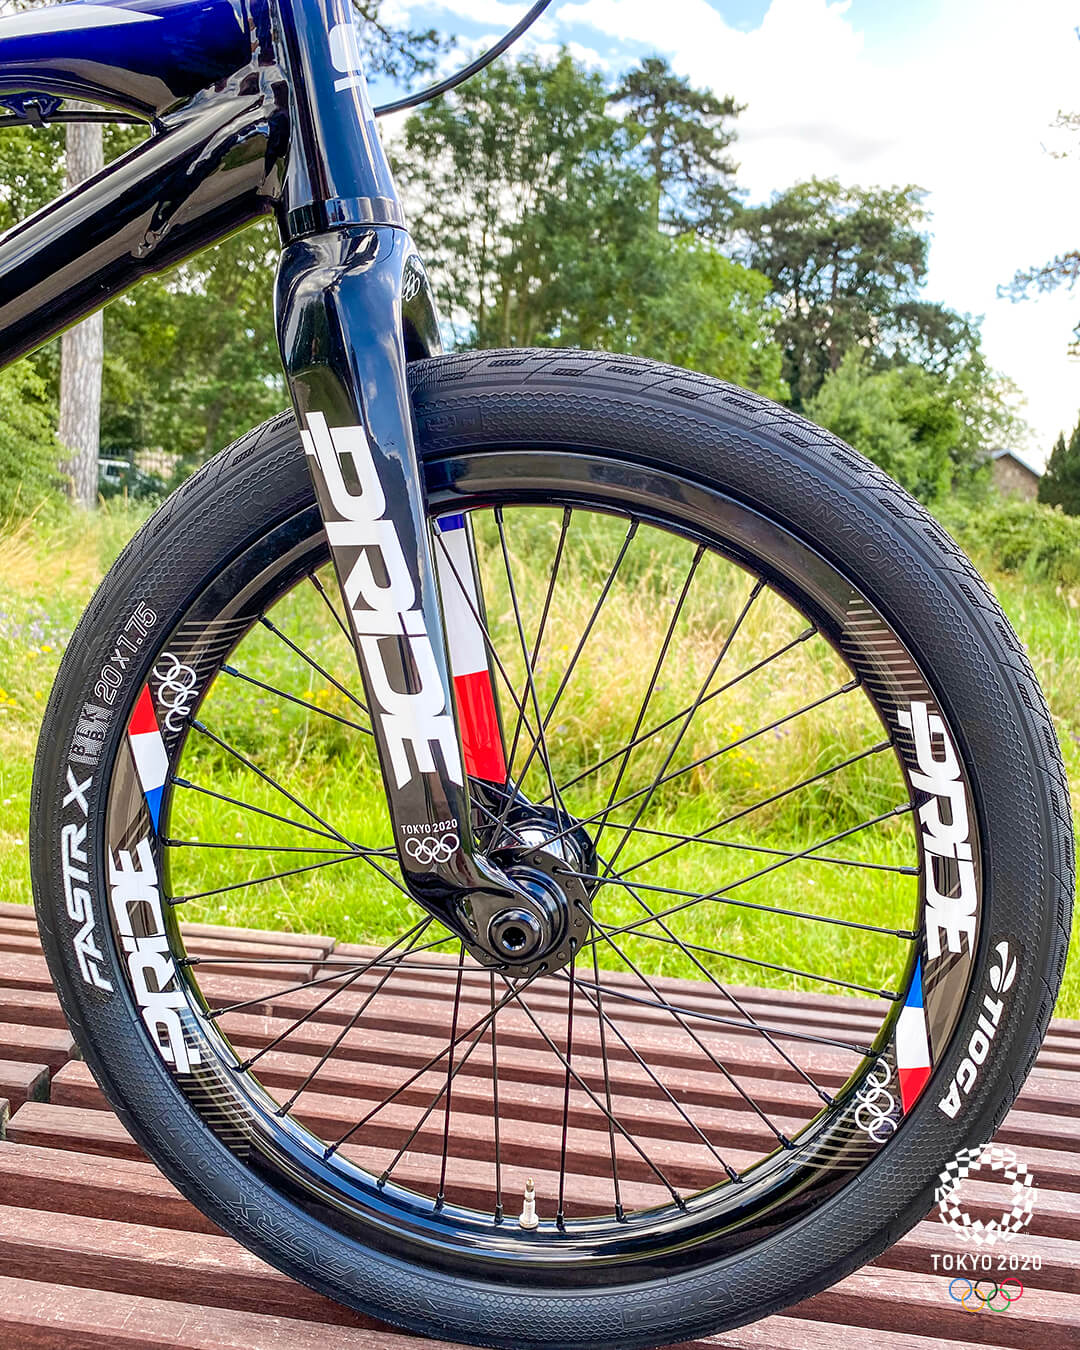 Romain Mahieu GT BMX Pride Racing Tokyo 2020 Olympic Bike